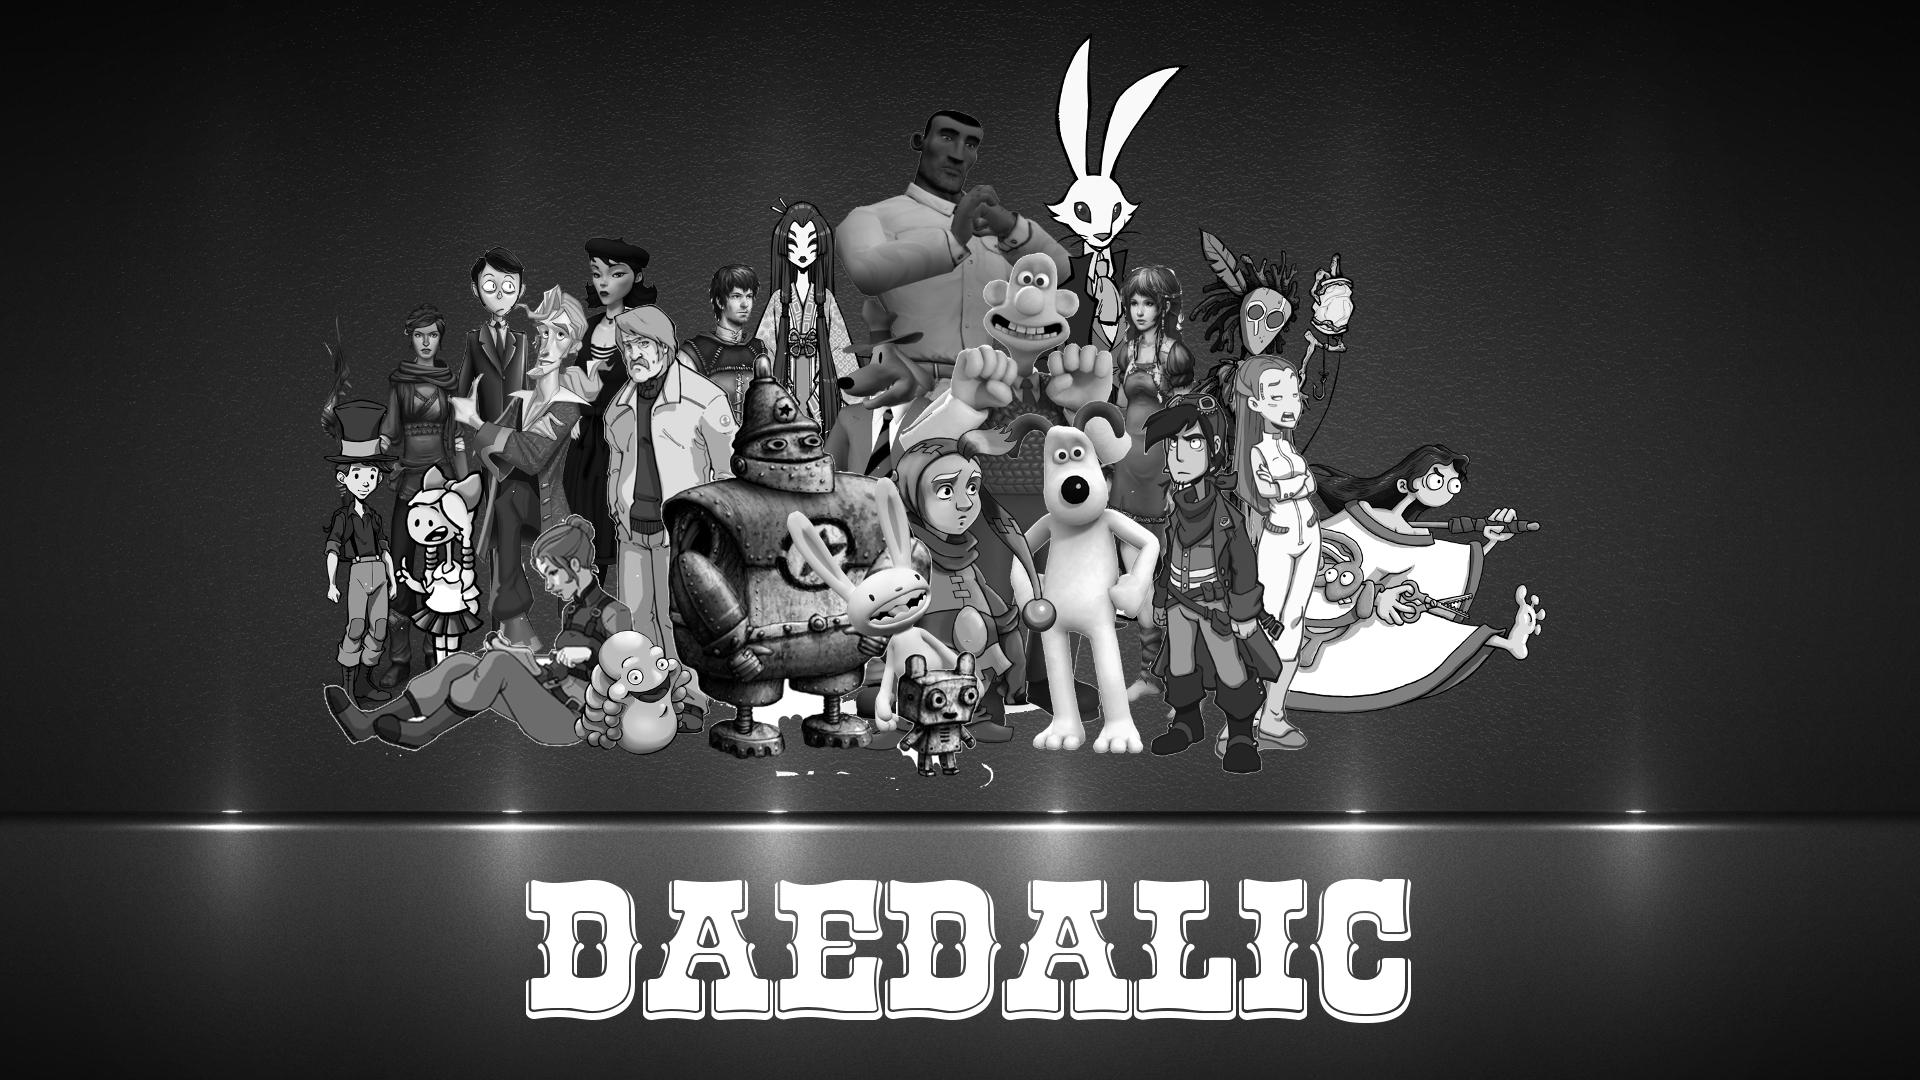 Daedlic